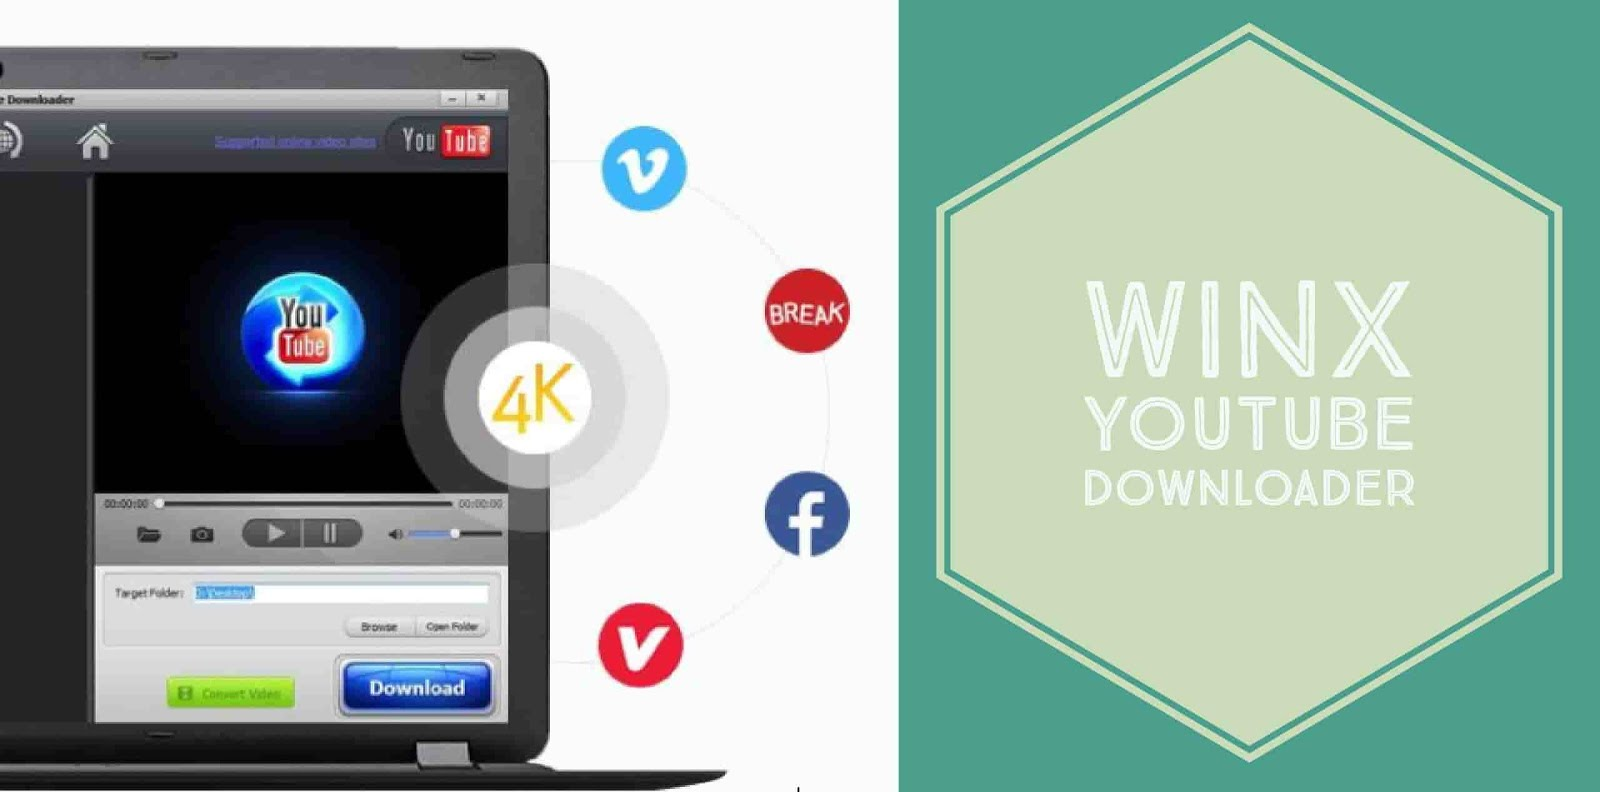 Youtube Mp Downloader Iphone Jailbreak